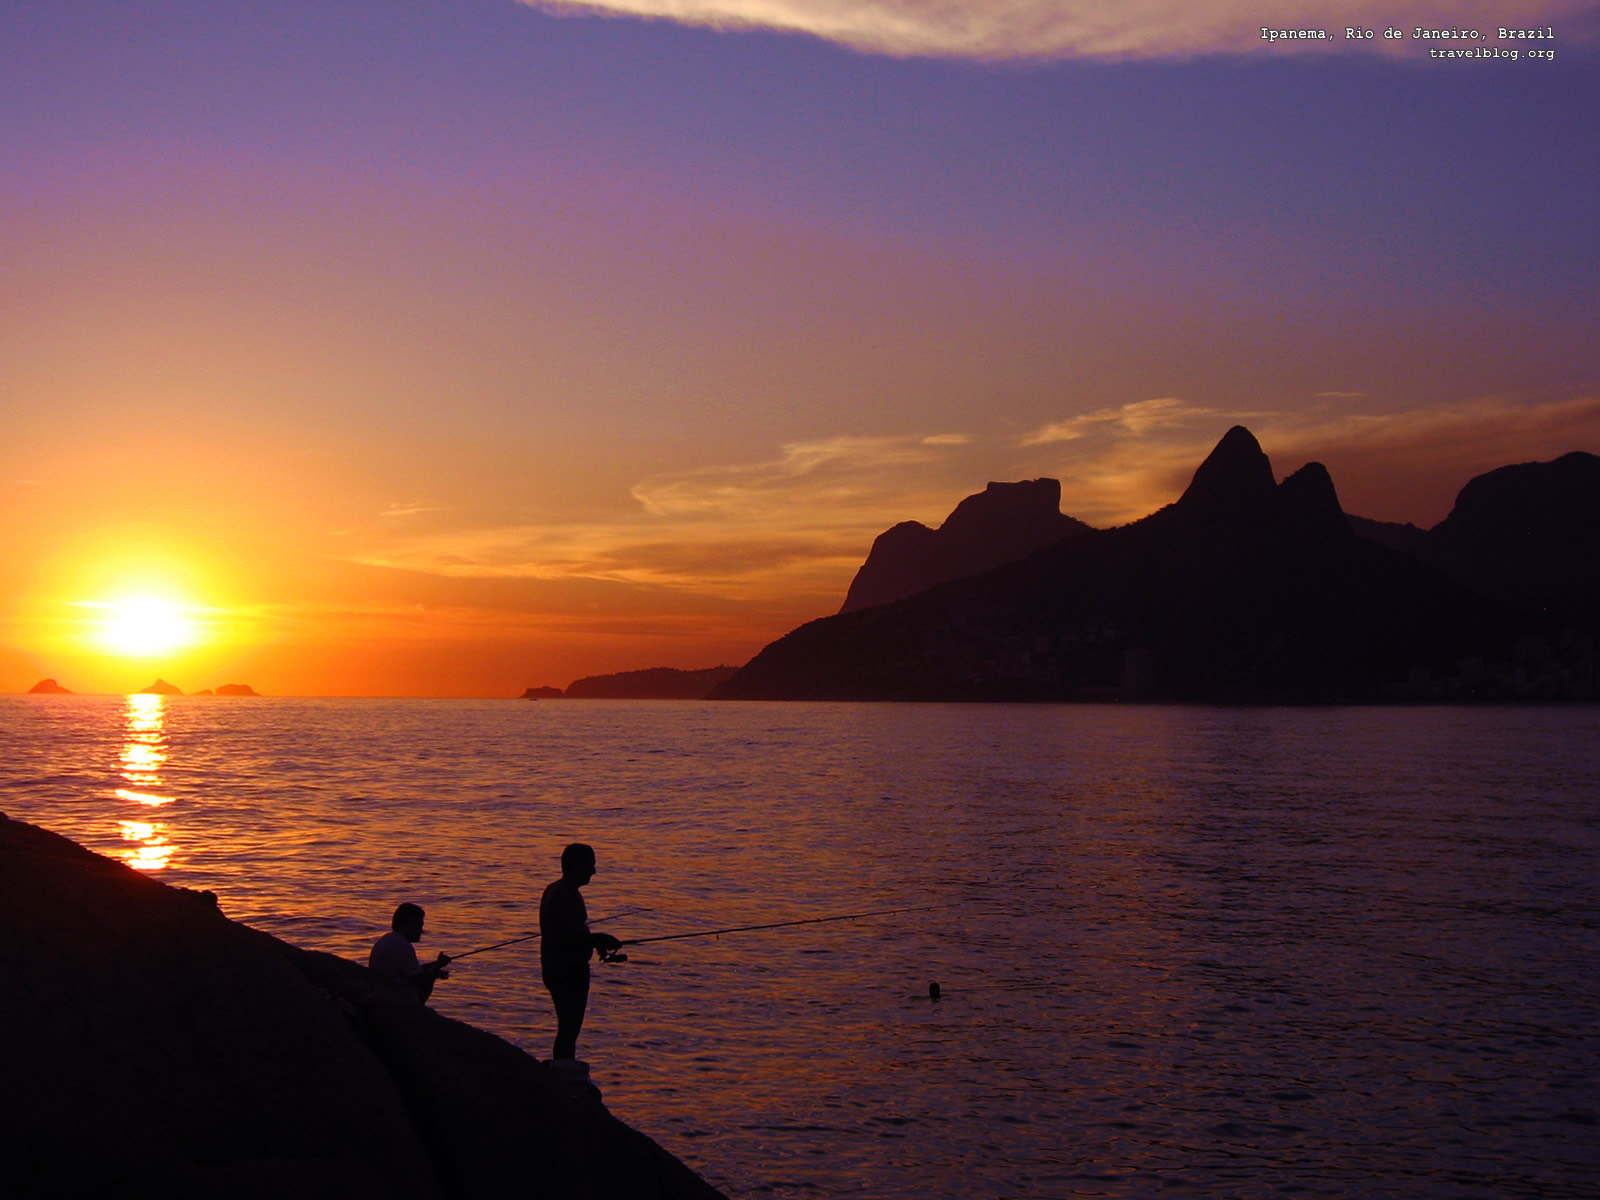 https://4.bp.blogspot.com/_4krEhApfbkY/TGPx9paAGPI/AAAAAAAAADI/TdD7WxffA1s/s1600/sunset_wallpaper_brazil-1600x1200.jpg